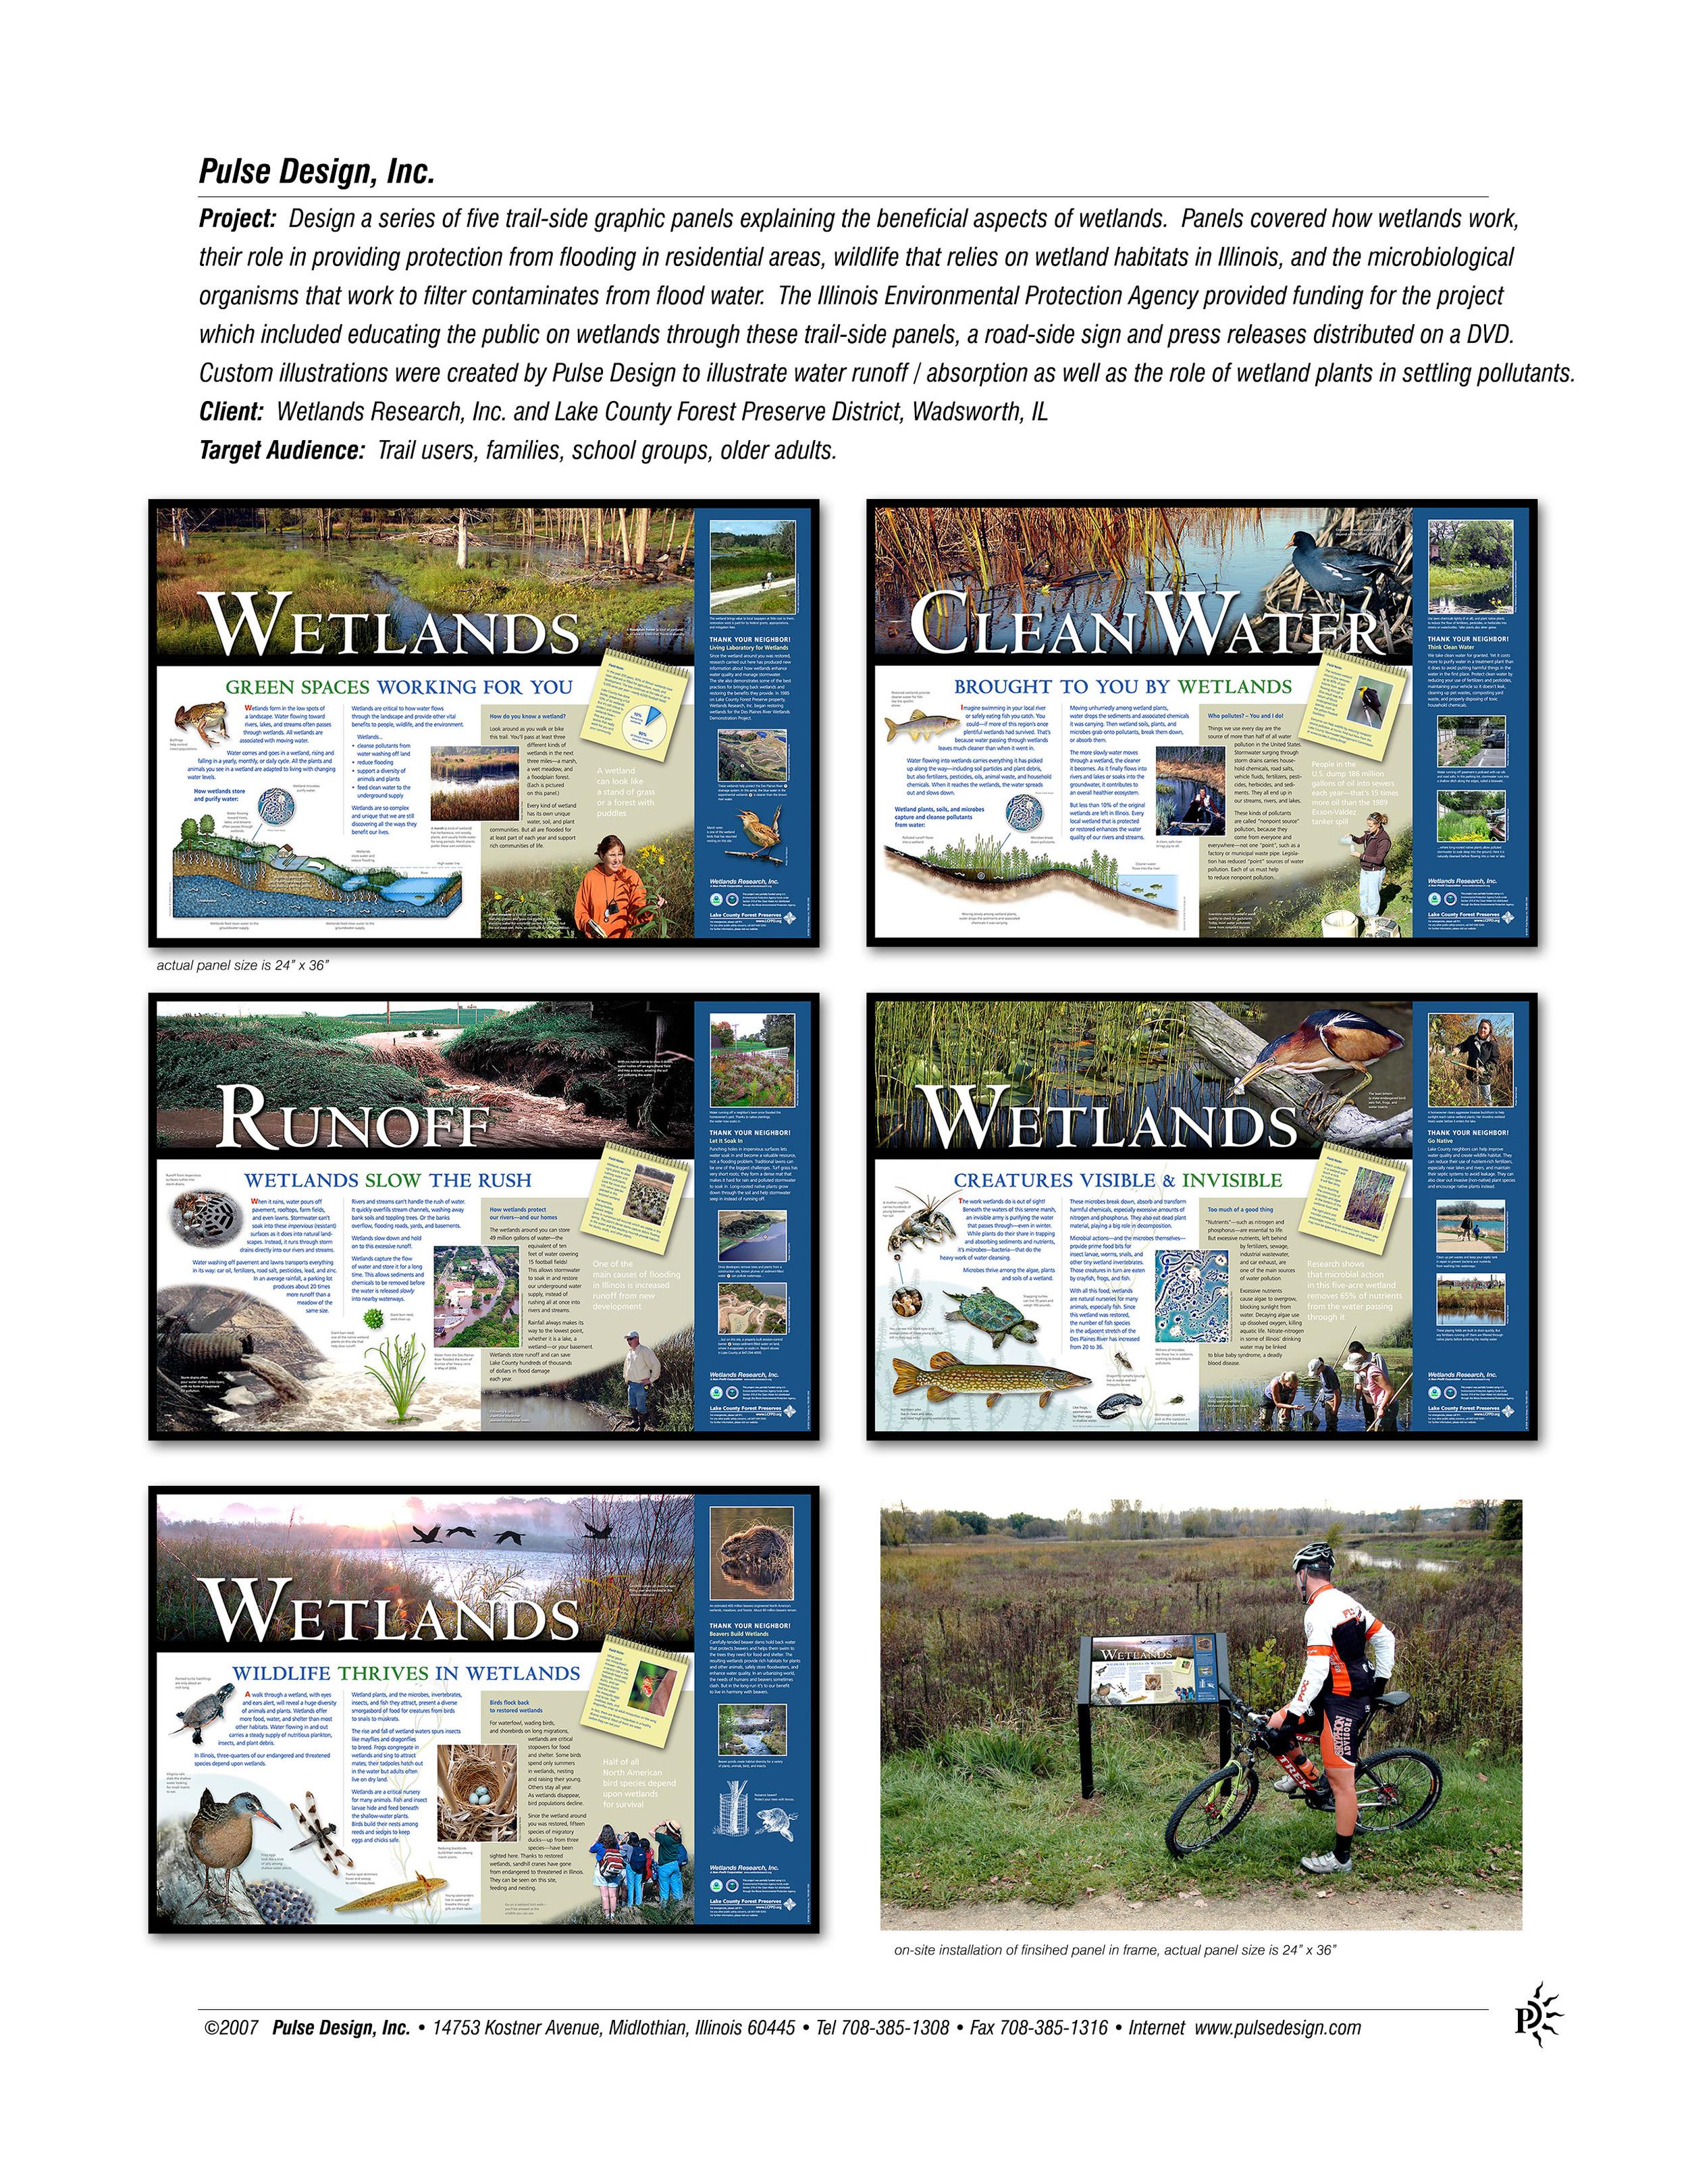 Wetlands-Research-Trail-Signs-Pulse-Design-Inc.jpg